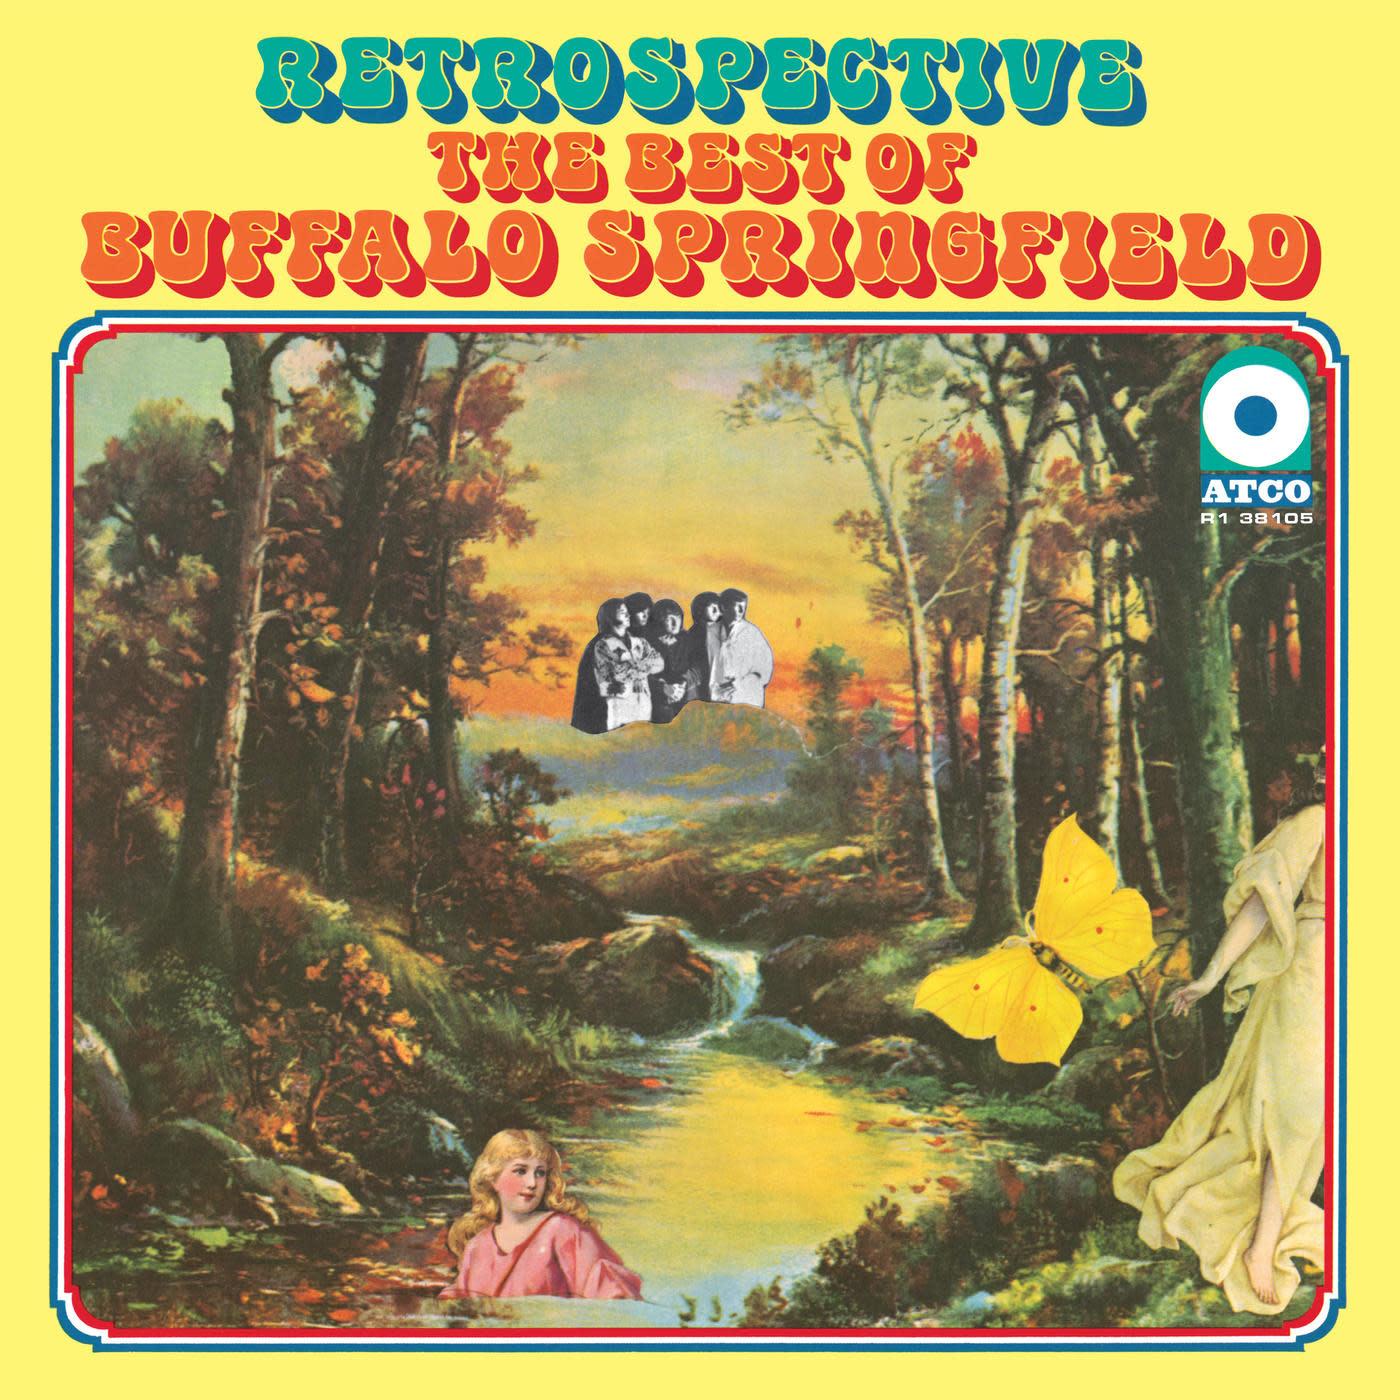 Buffalo Springfield – Retrospective - The Best Of Buffalo Springfield